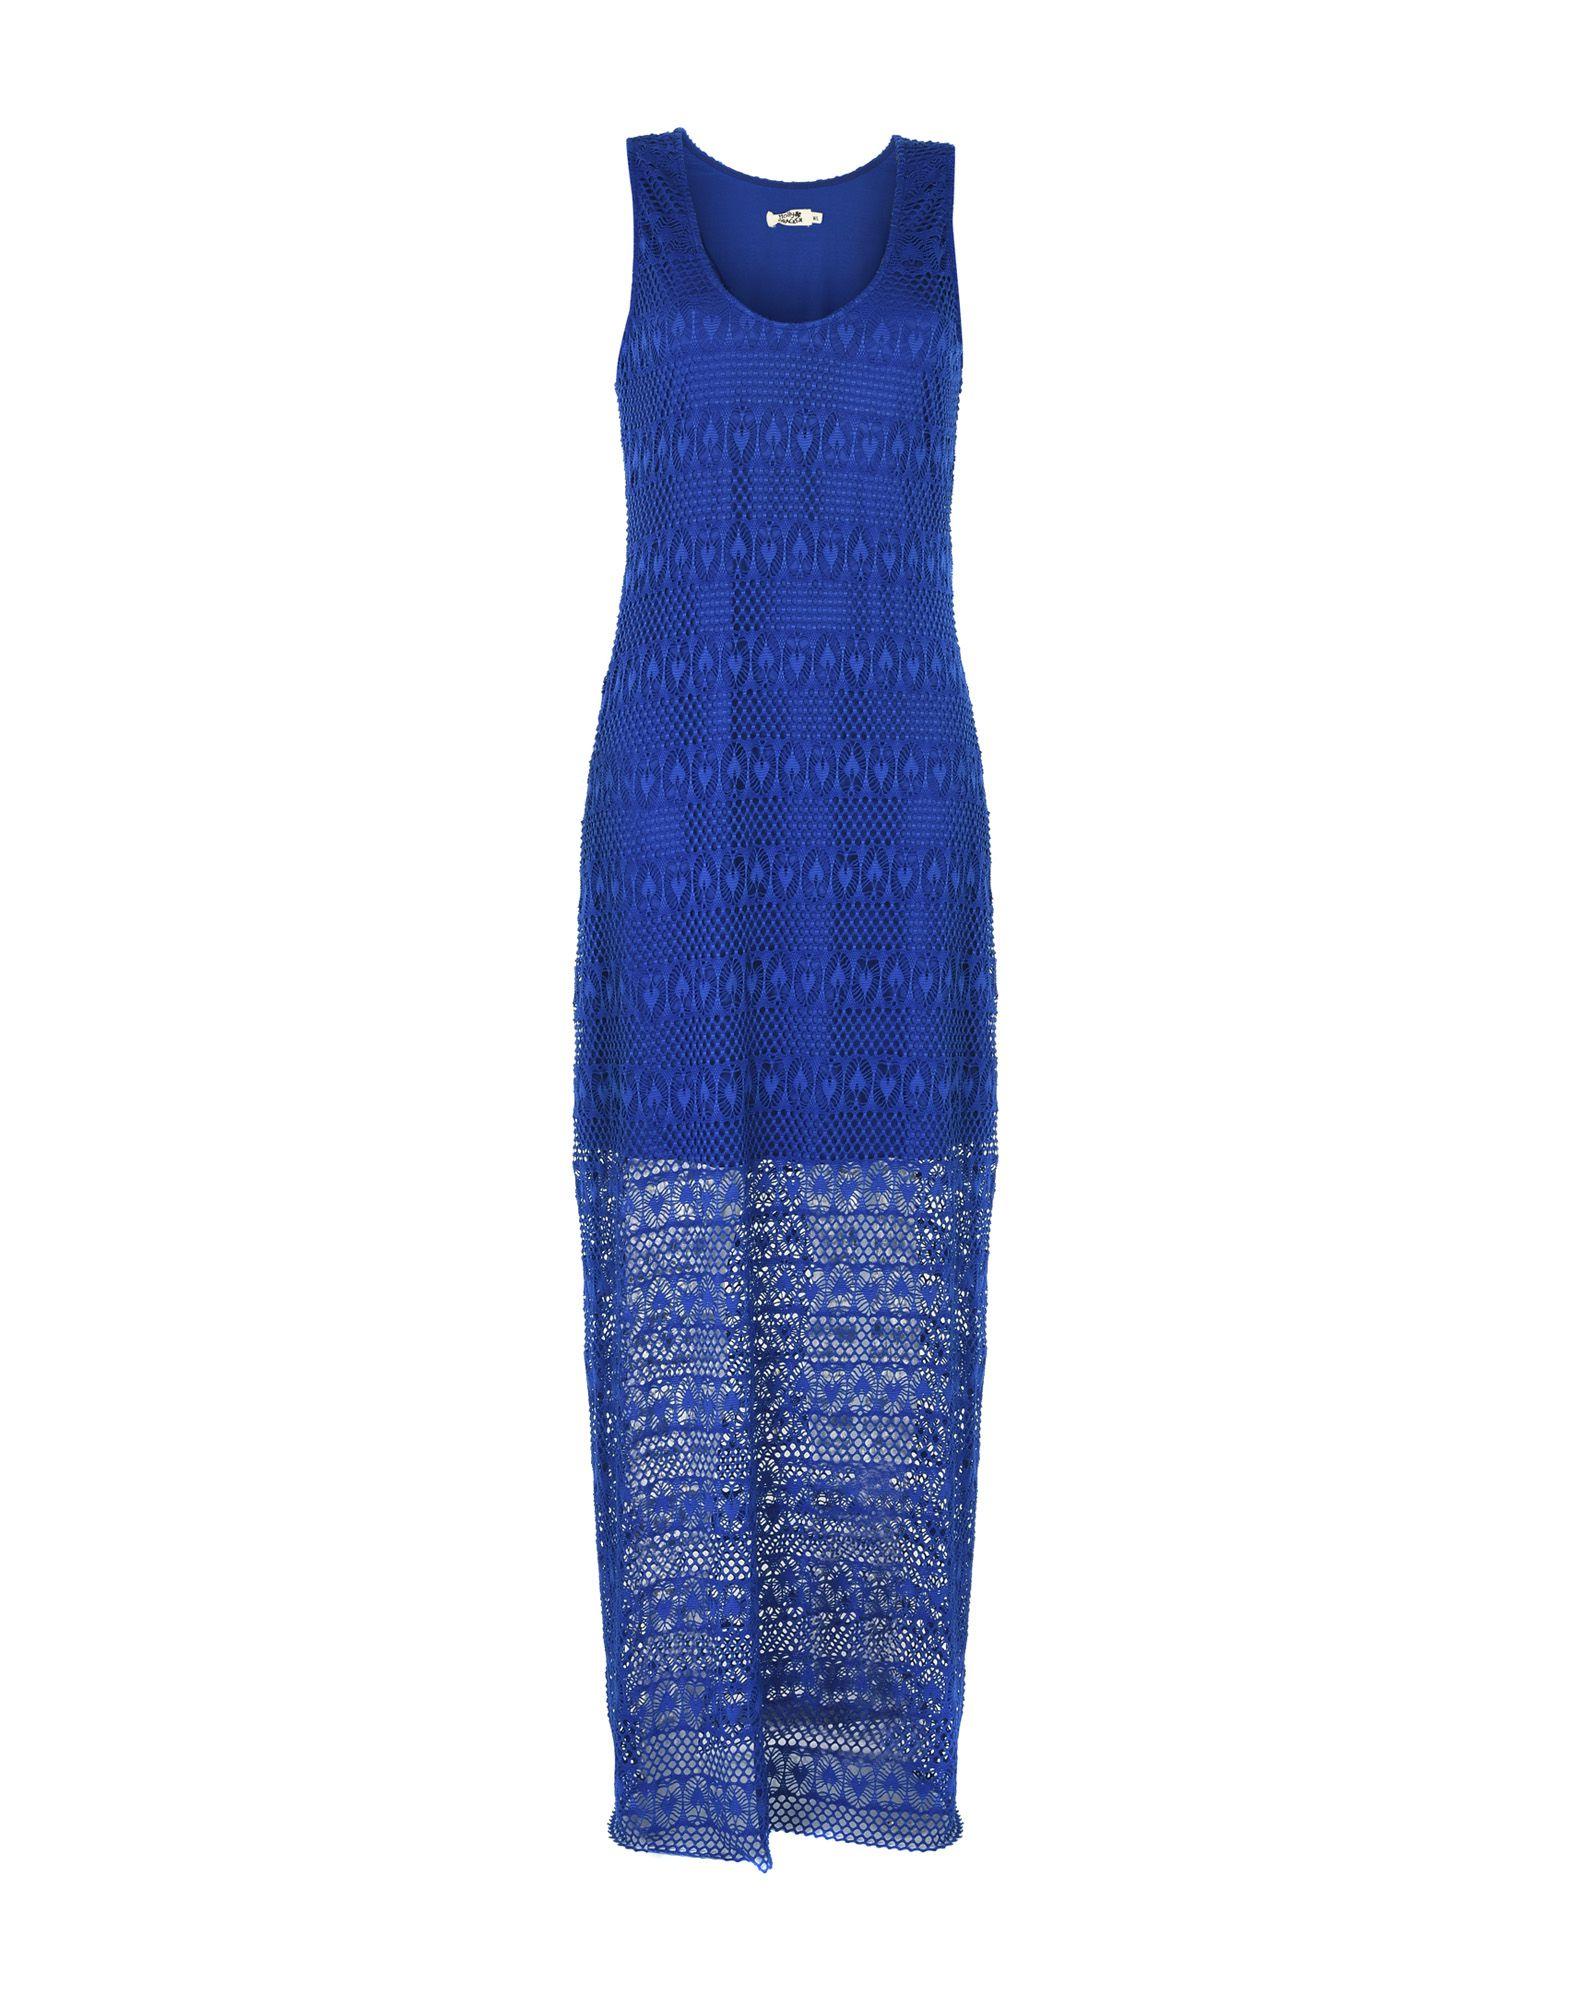 MOLLY BRACKEN Длинное платье molly bracken ремень